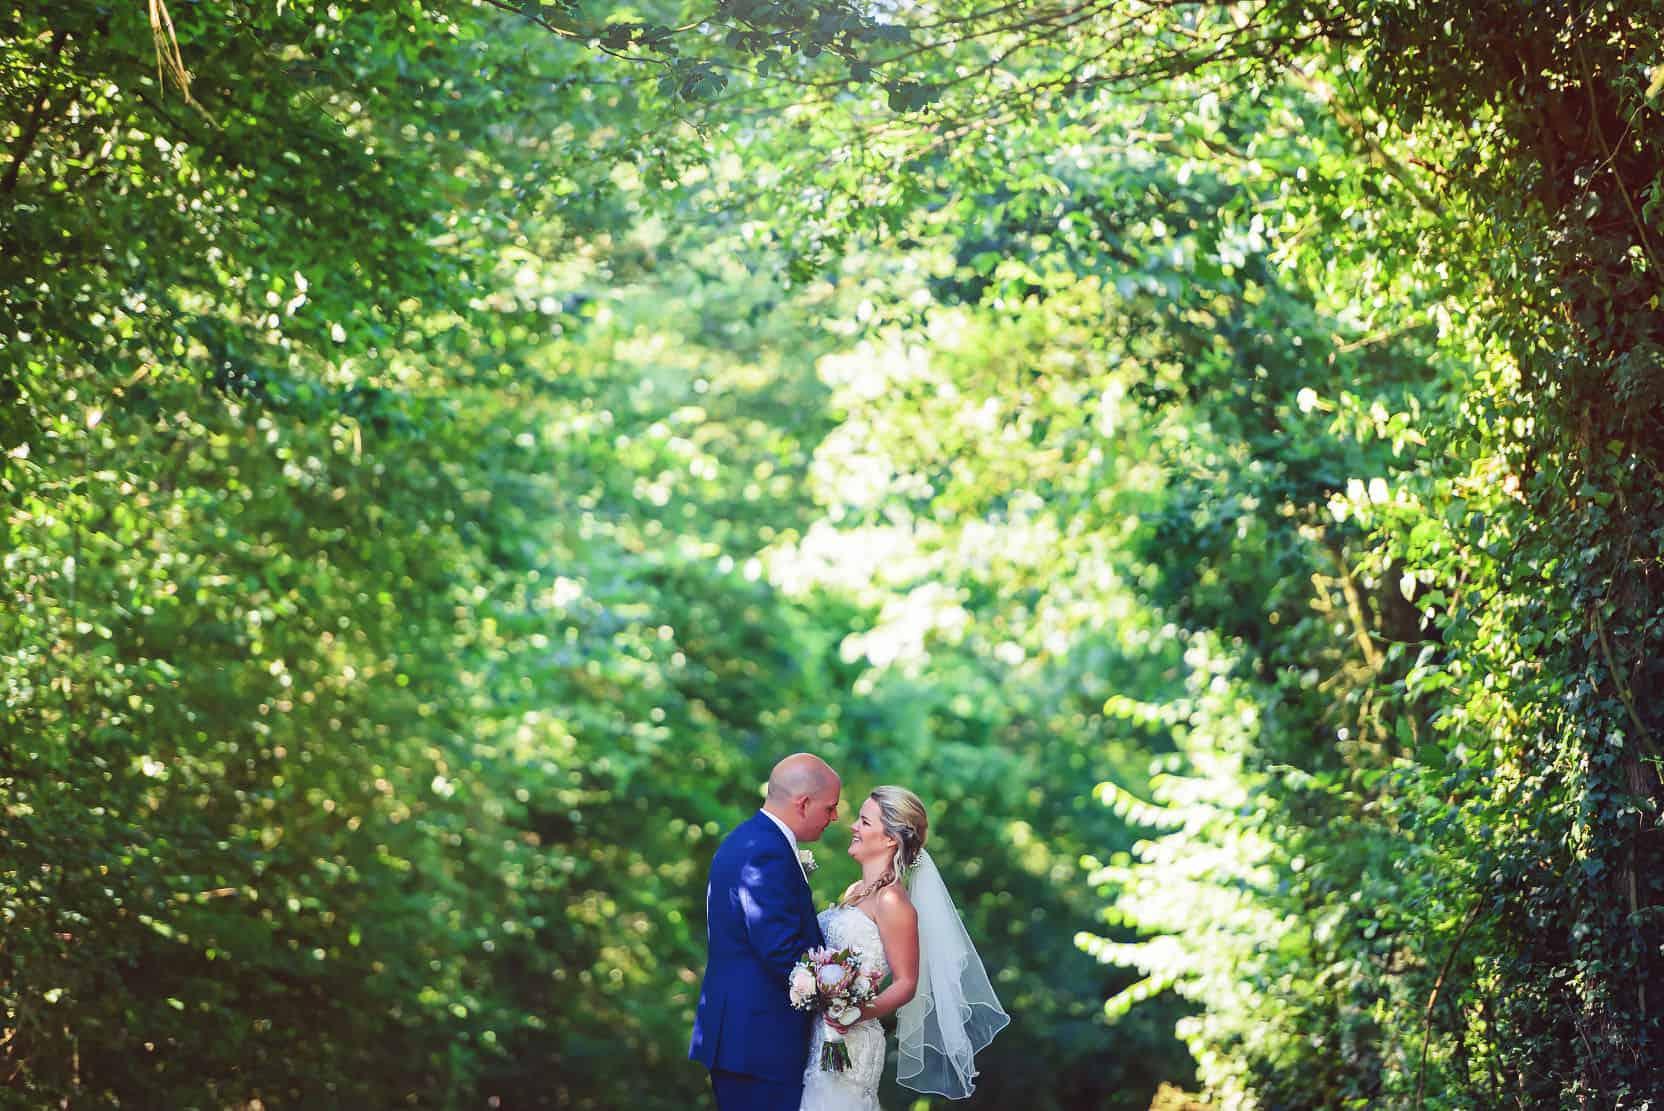 032_Maidens_Barn_Wedding_Essex_NJ_Justin_Bailey_Photography